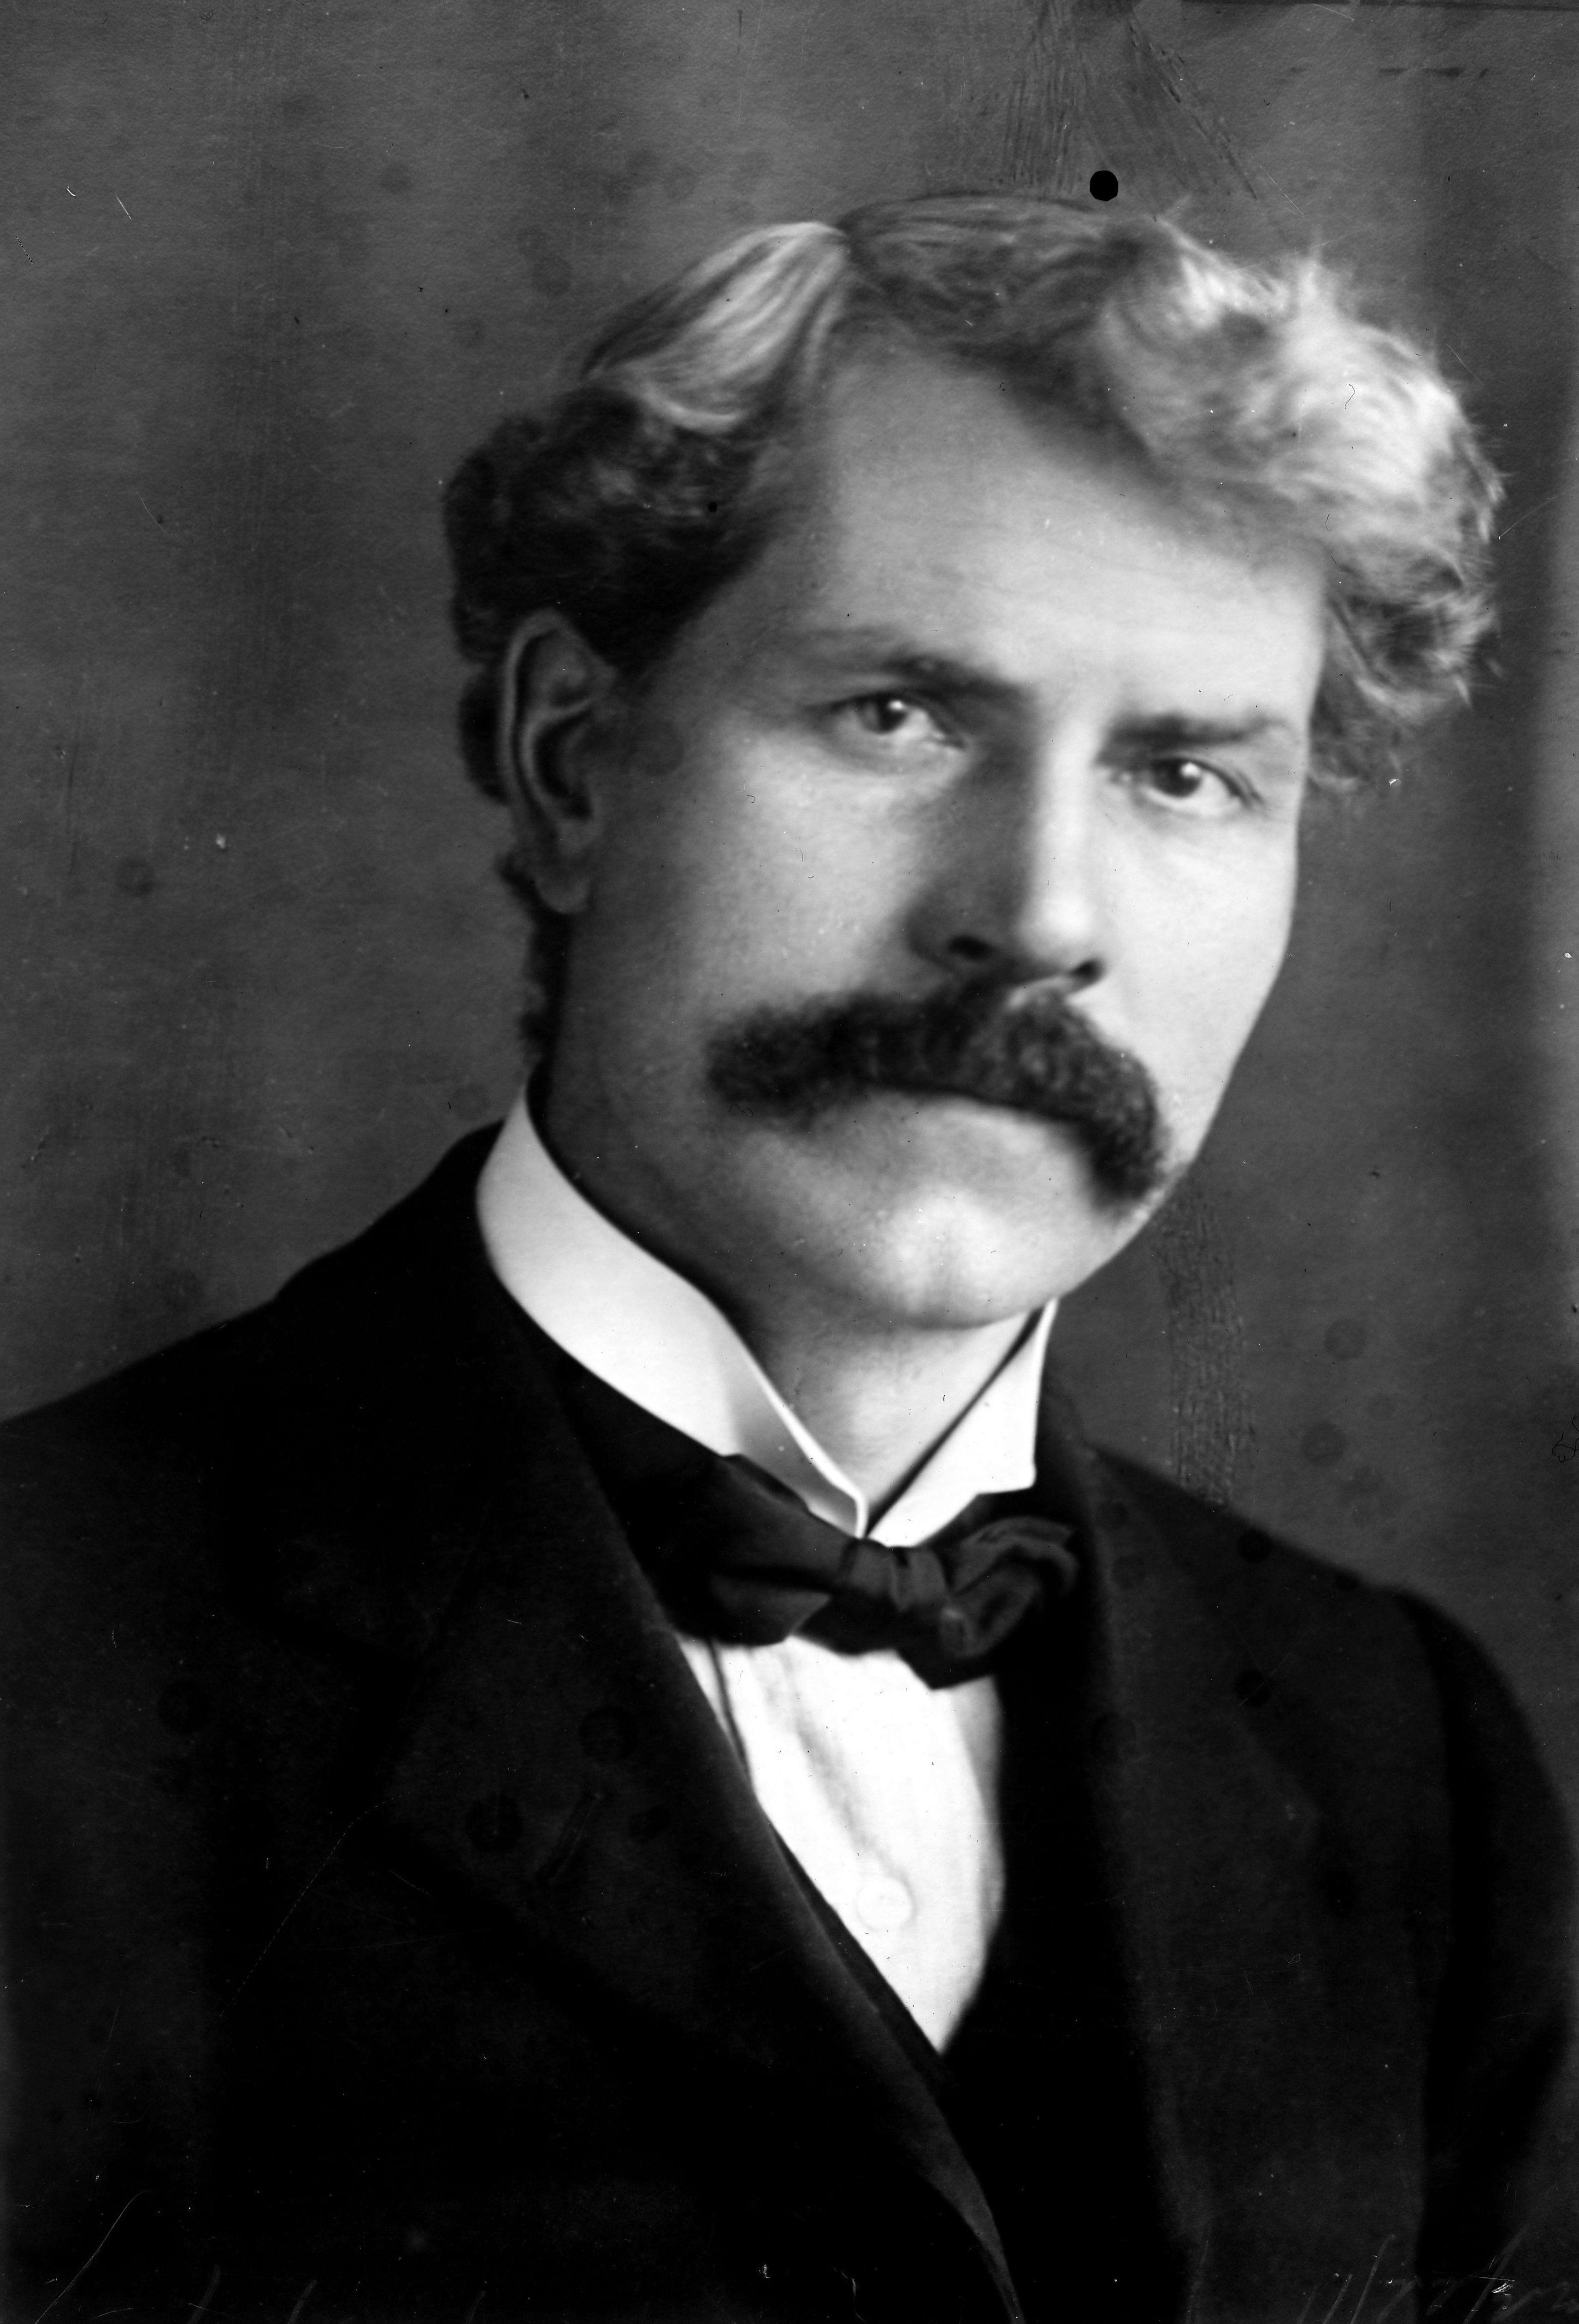 Description Ramsay MacDonald rightfacing.29588.jpg